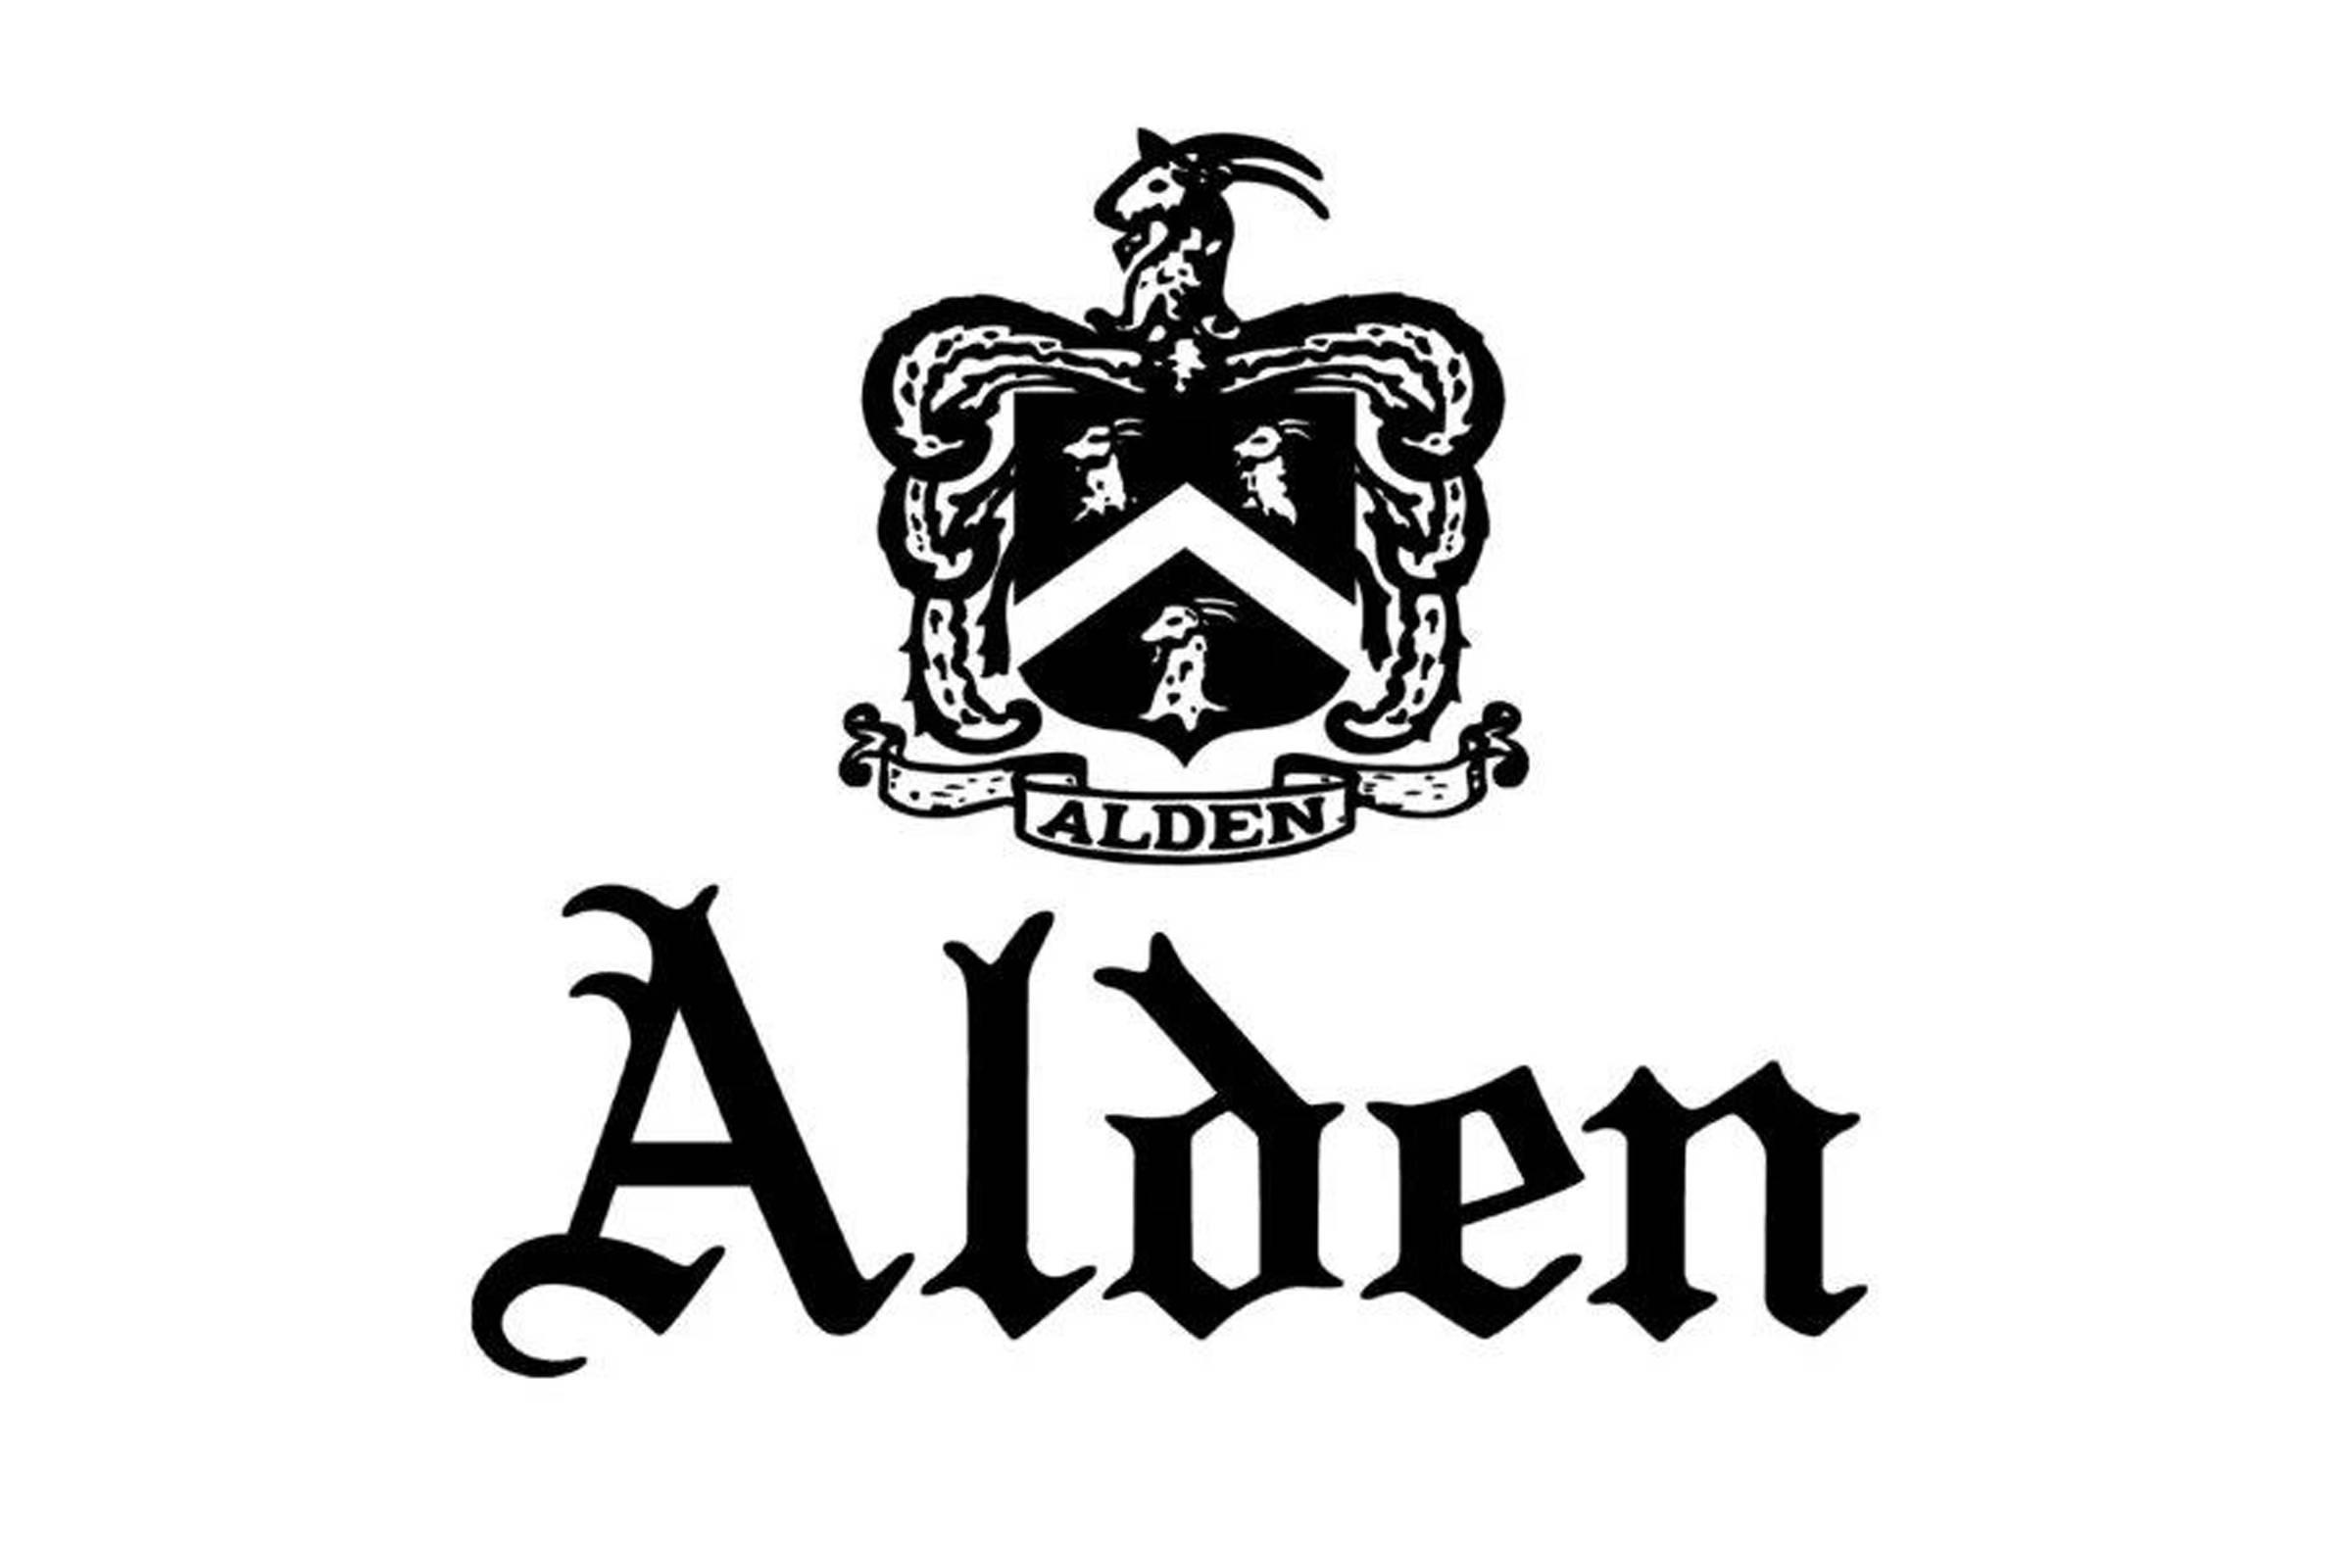 Preppy Clothing Brands: Alden